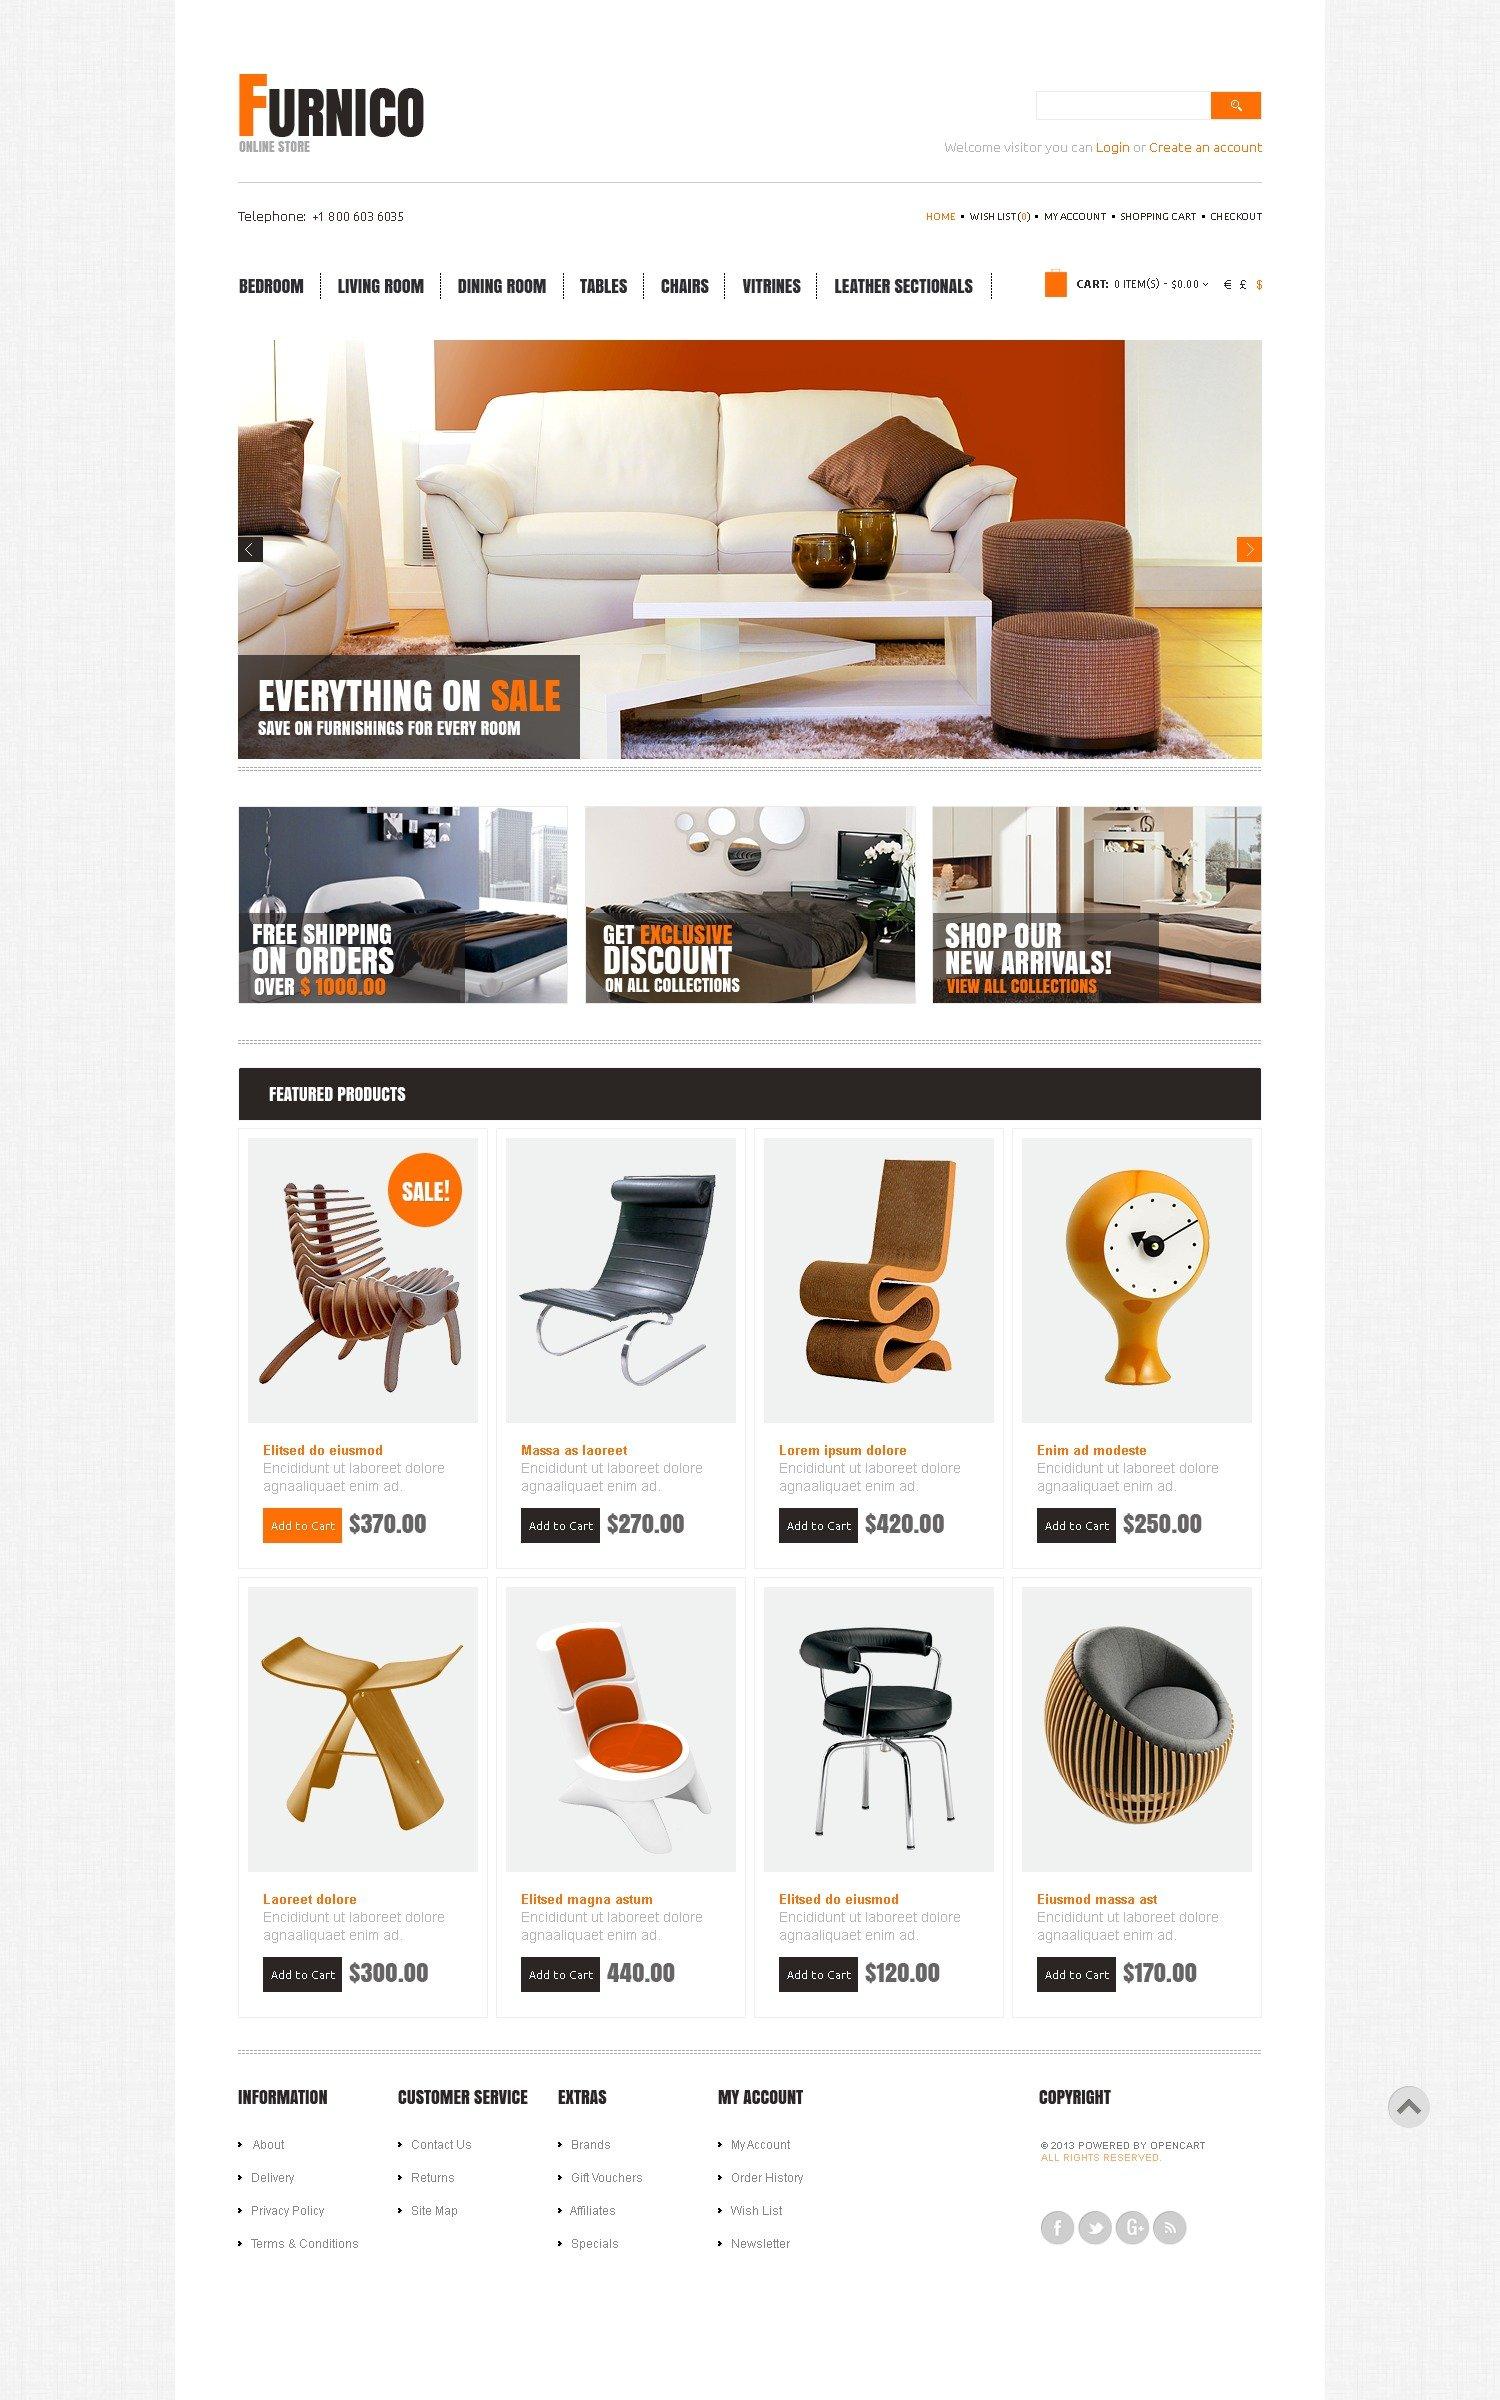 Furniture for Comfort №42997 - скриншот